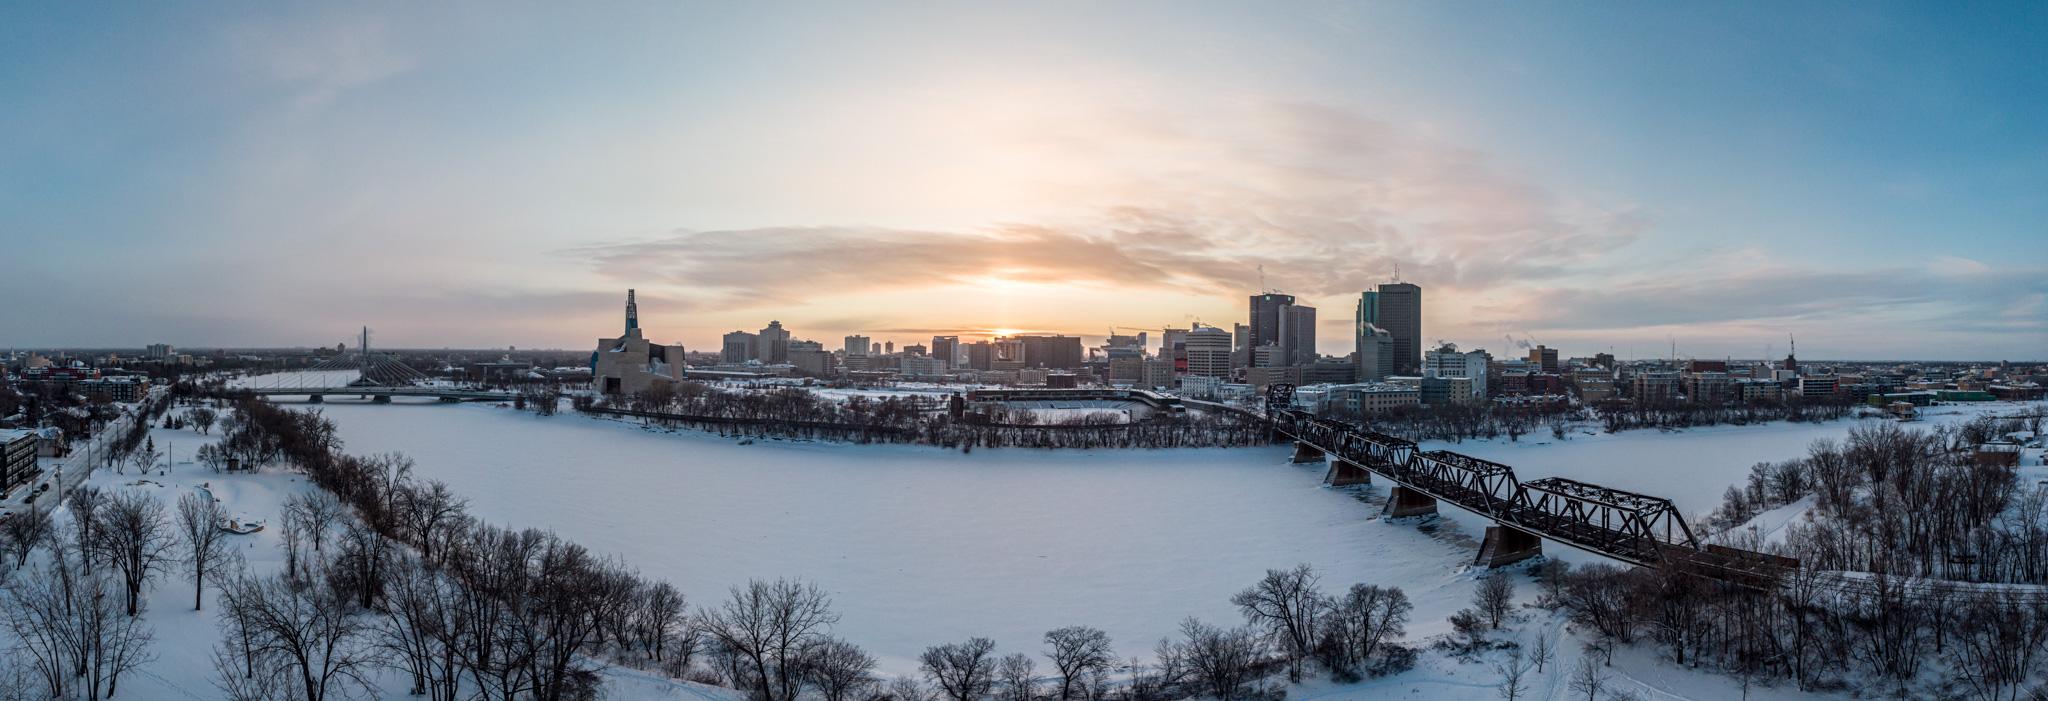 Upscape Downtown Winnipeg